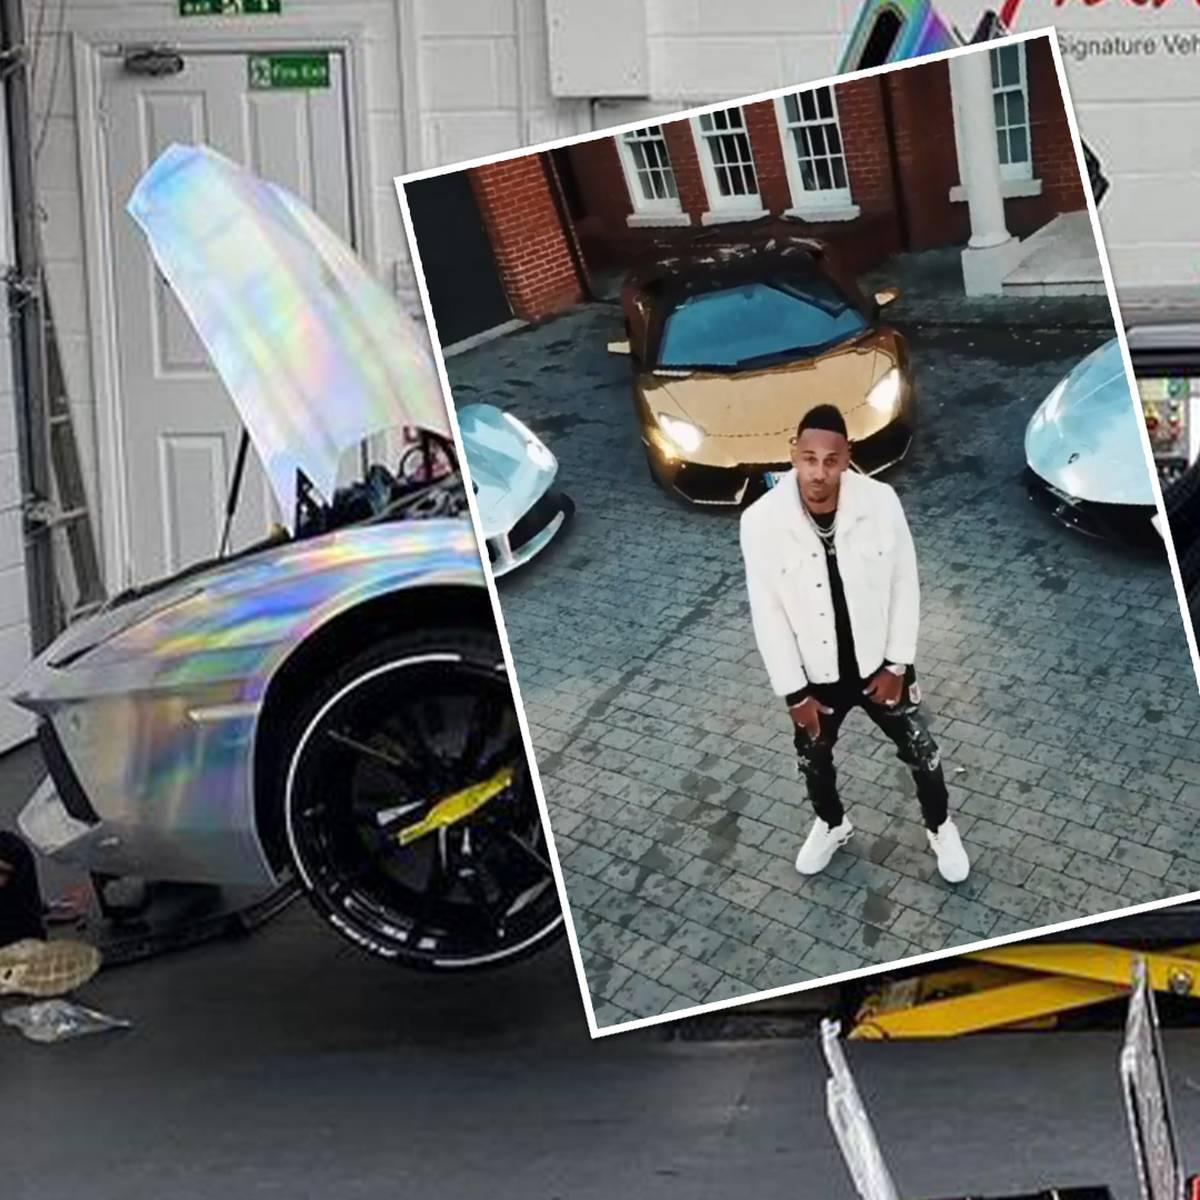 Hologramm-Style: Aubameyang pimpt seinen Lamborghini